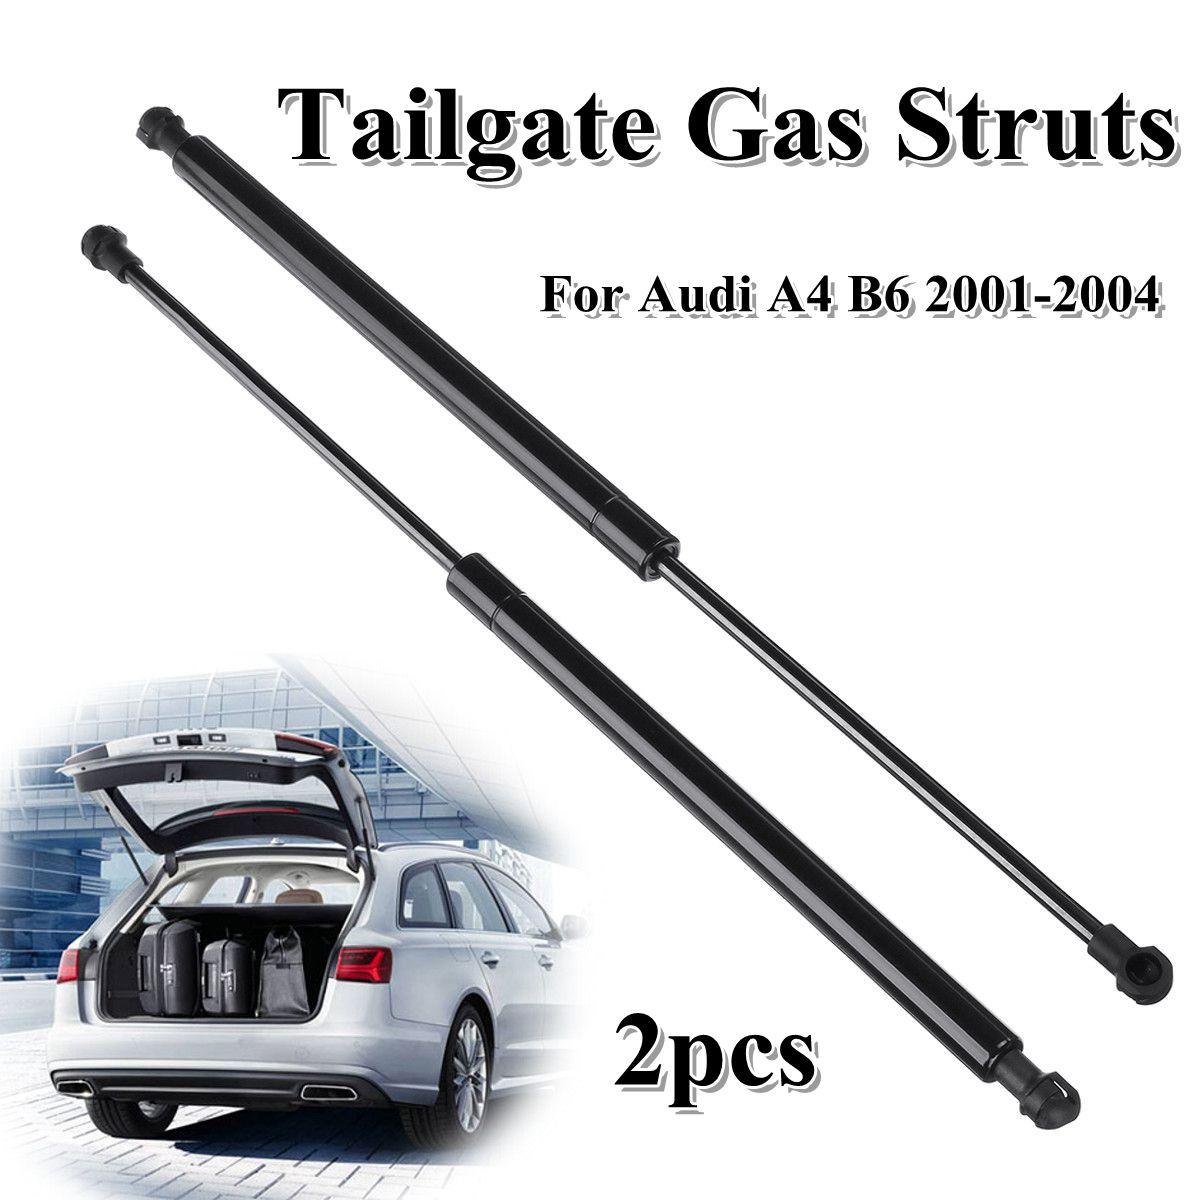 2 x Car Gas Spring Tailgate Strut Holder